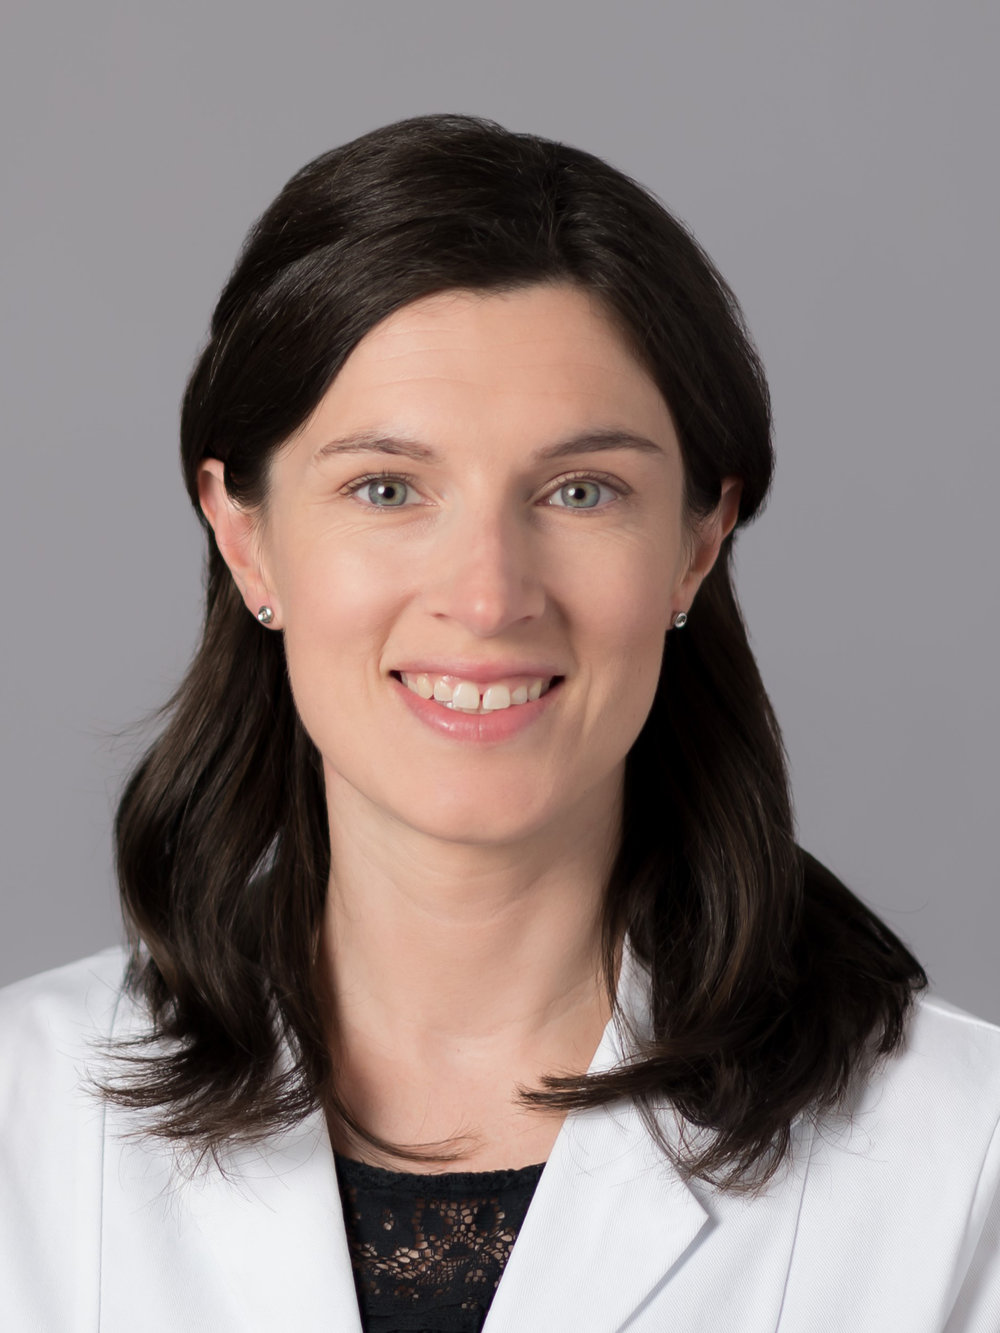 Julia Rotow